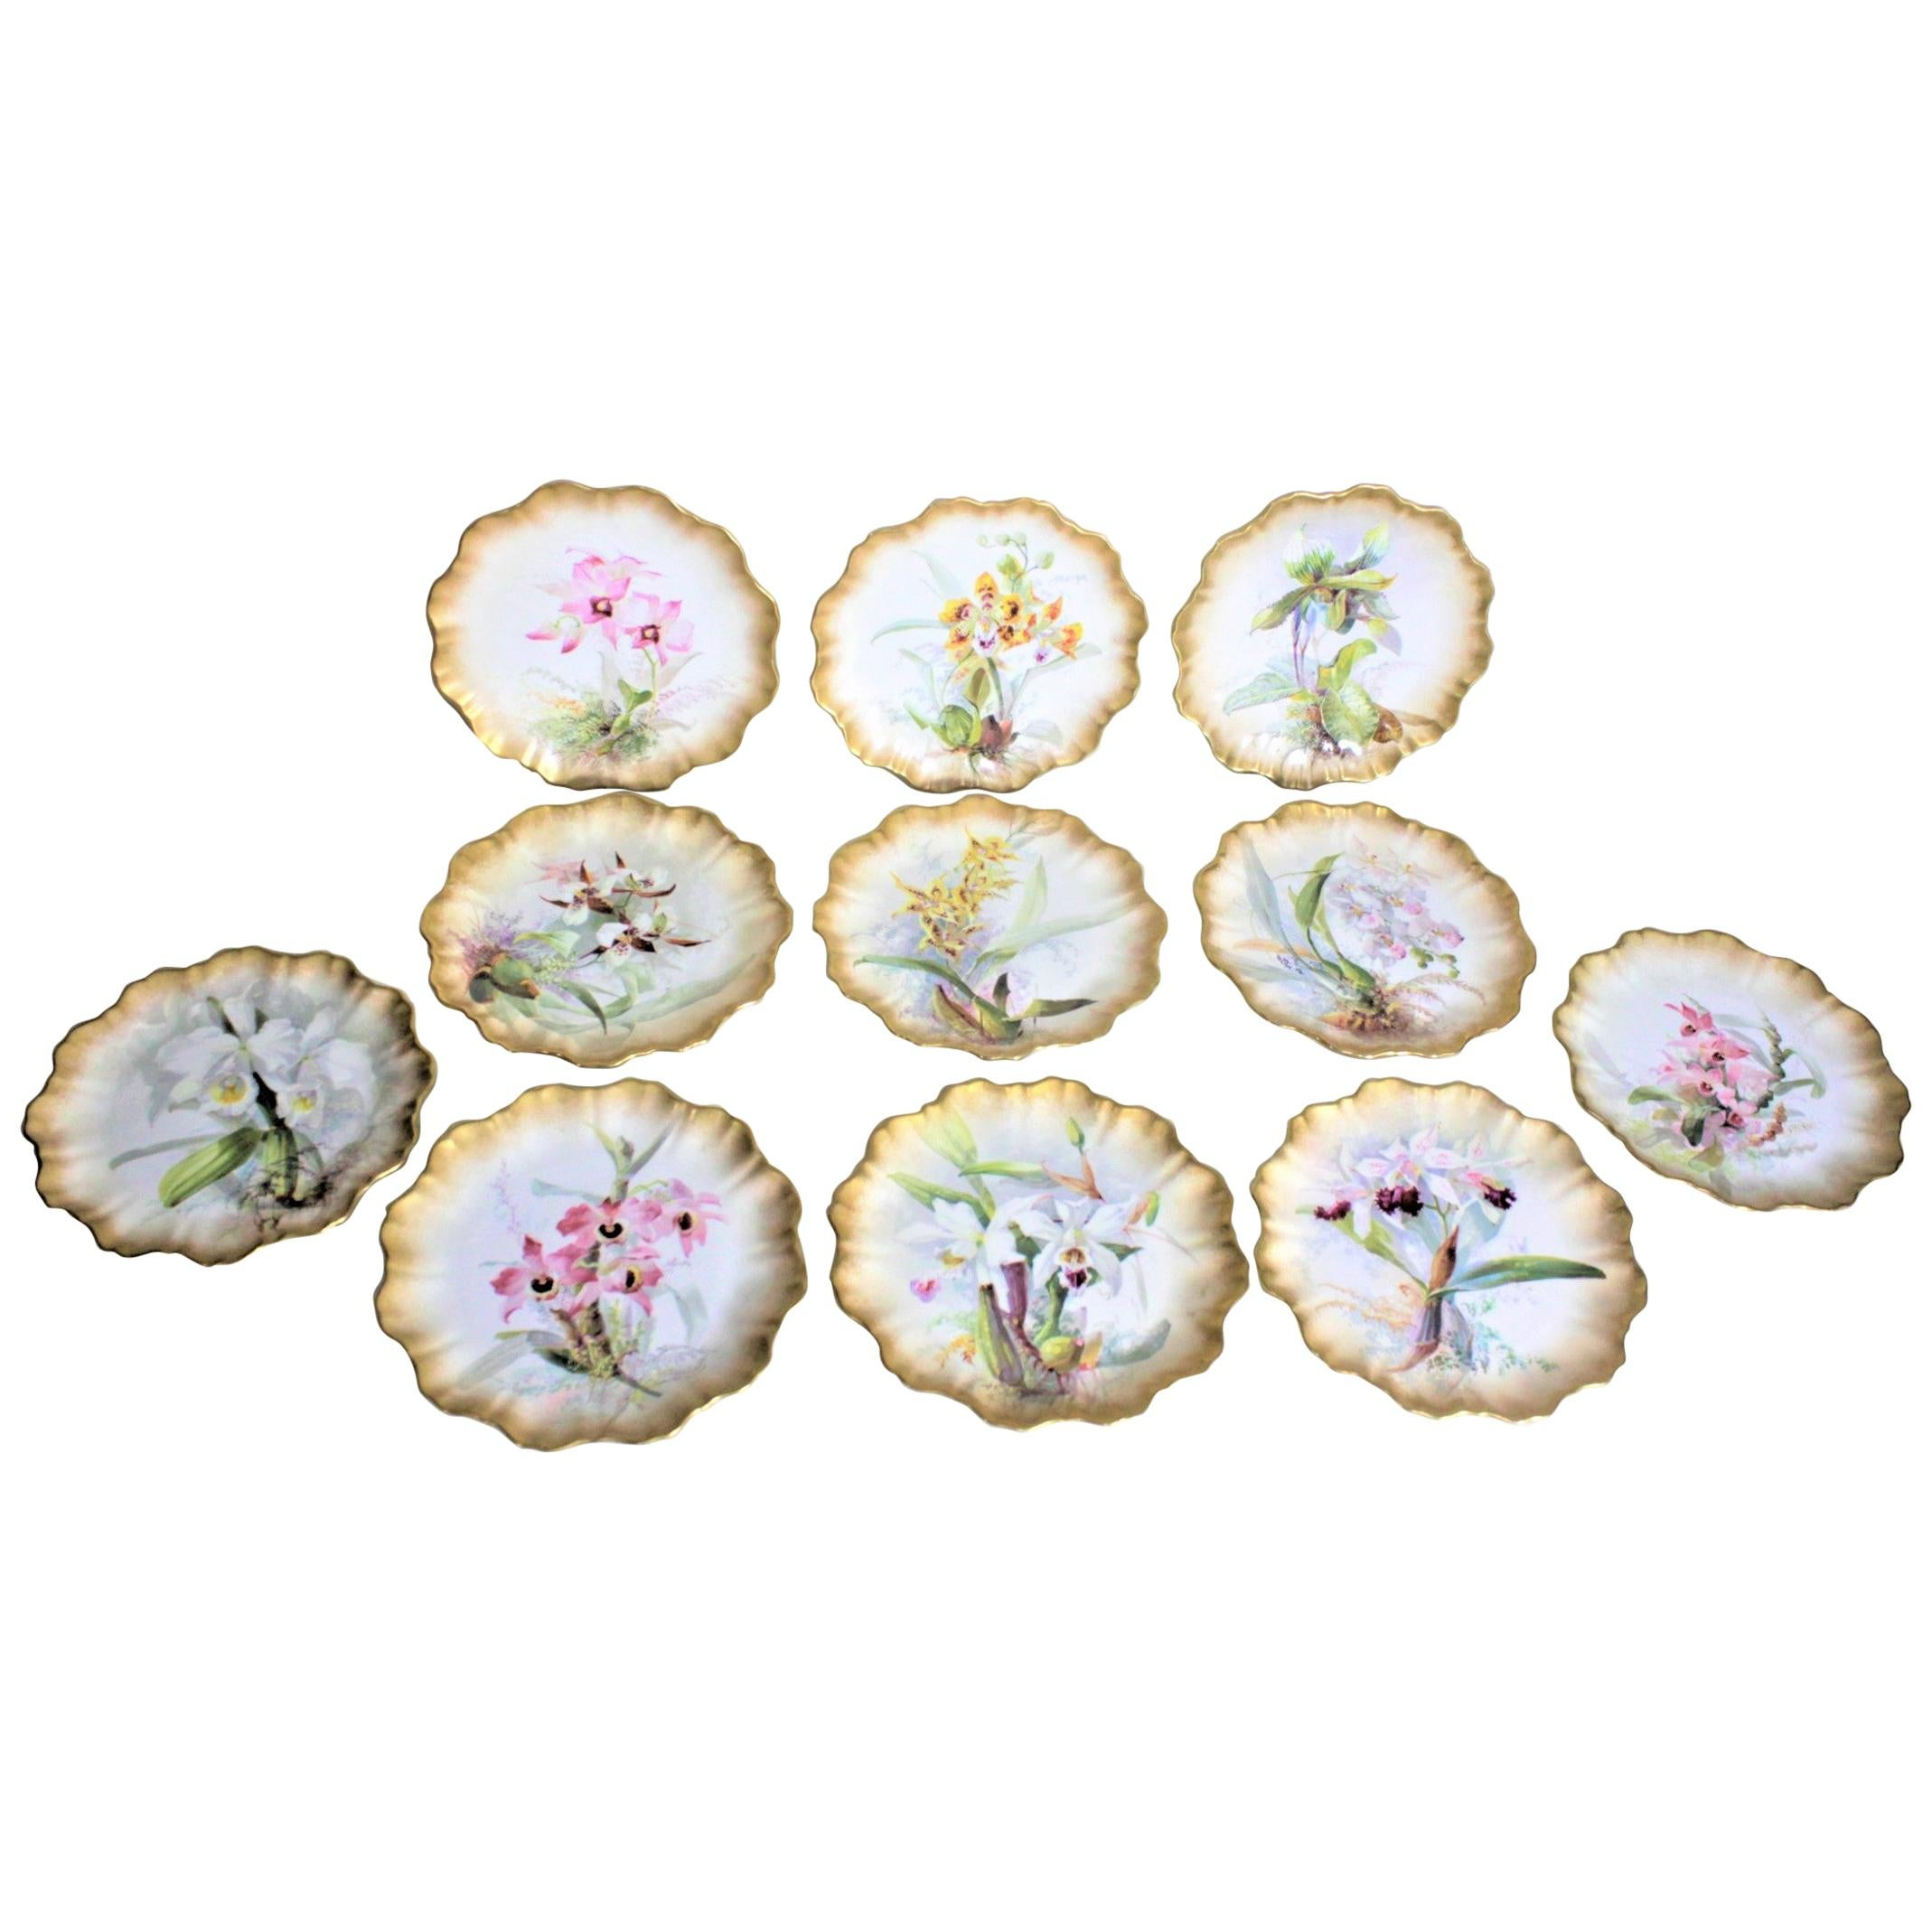 Set of Antique Hand Painted D. Dewsberry Iris Cabinet Plates for Doulton Burslem